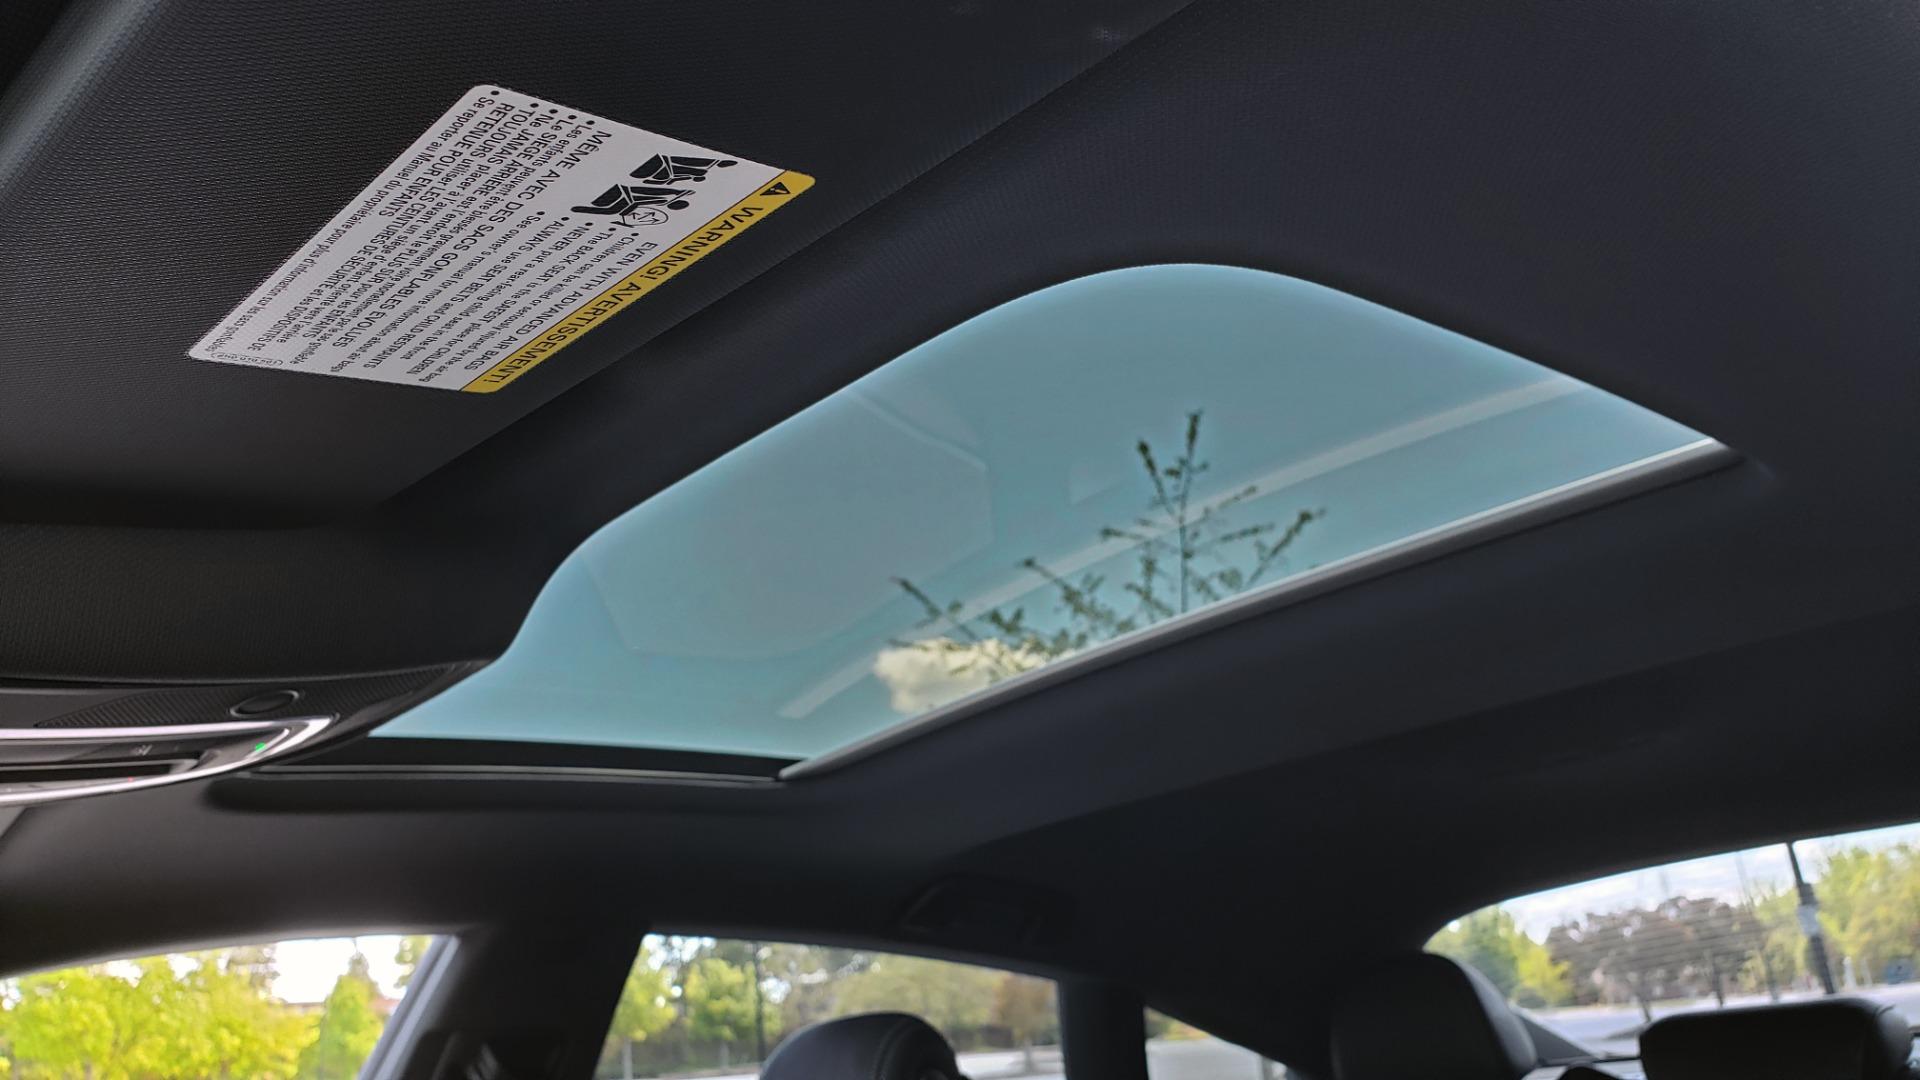 Used 2018 Audi S5 SPORTBACK PRESTIGE S-SPORT / NAV / SUNROOF / HUD / B&O SND / REARVIEW for sale $48,995 at Formula Imports in Charlotte NC 28227 45